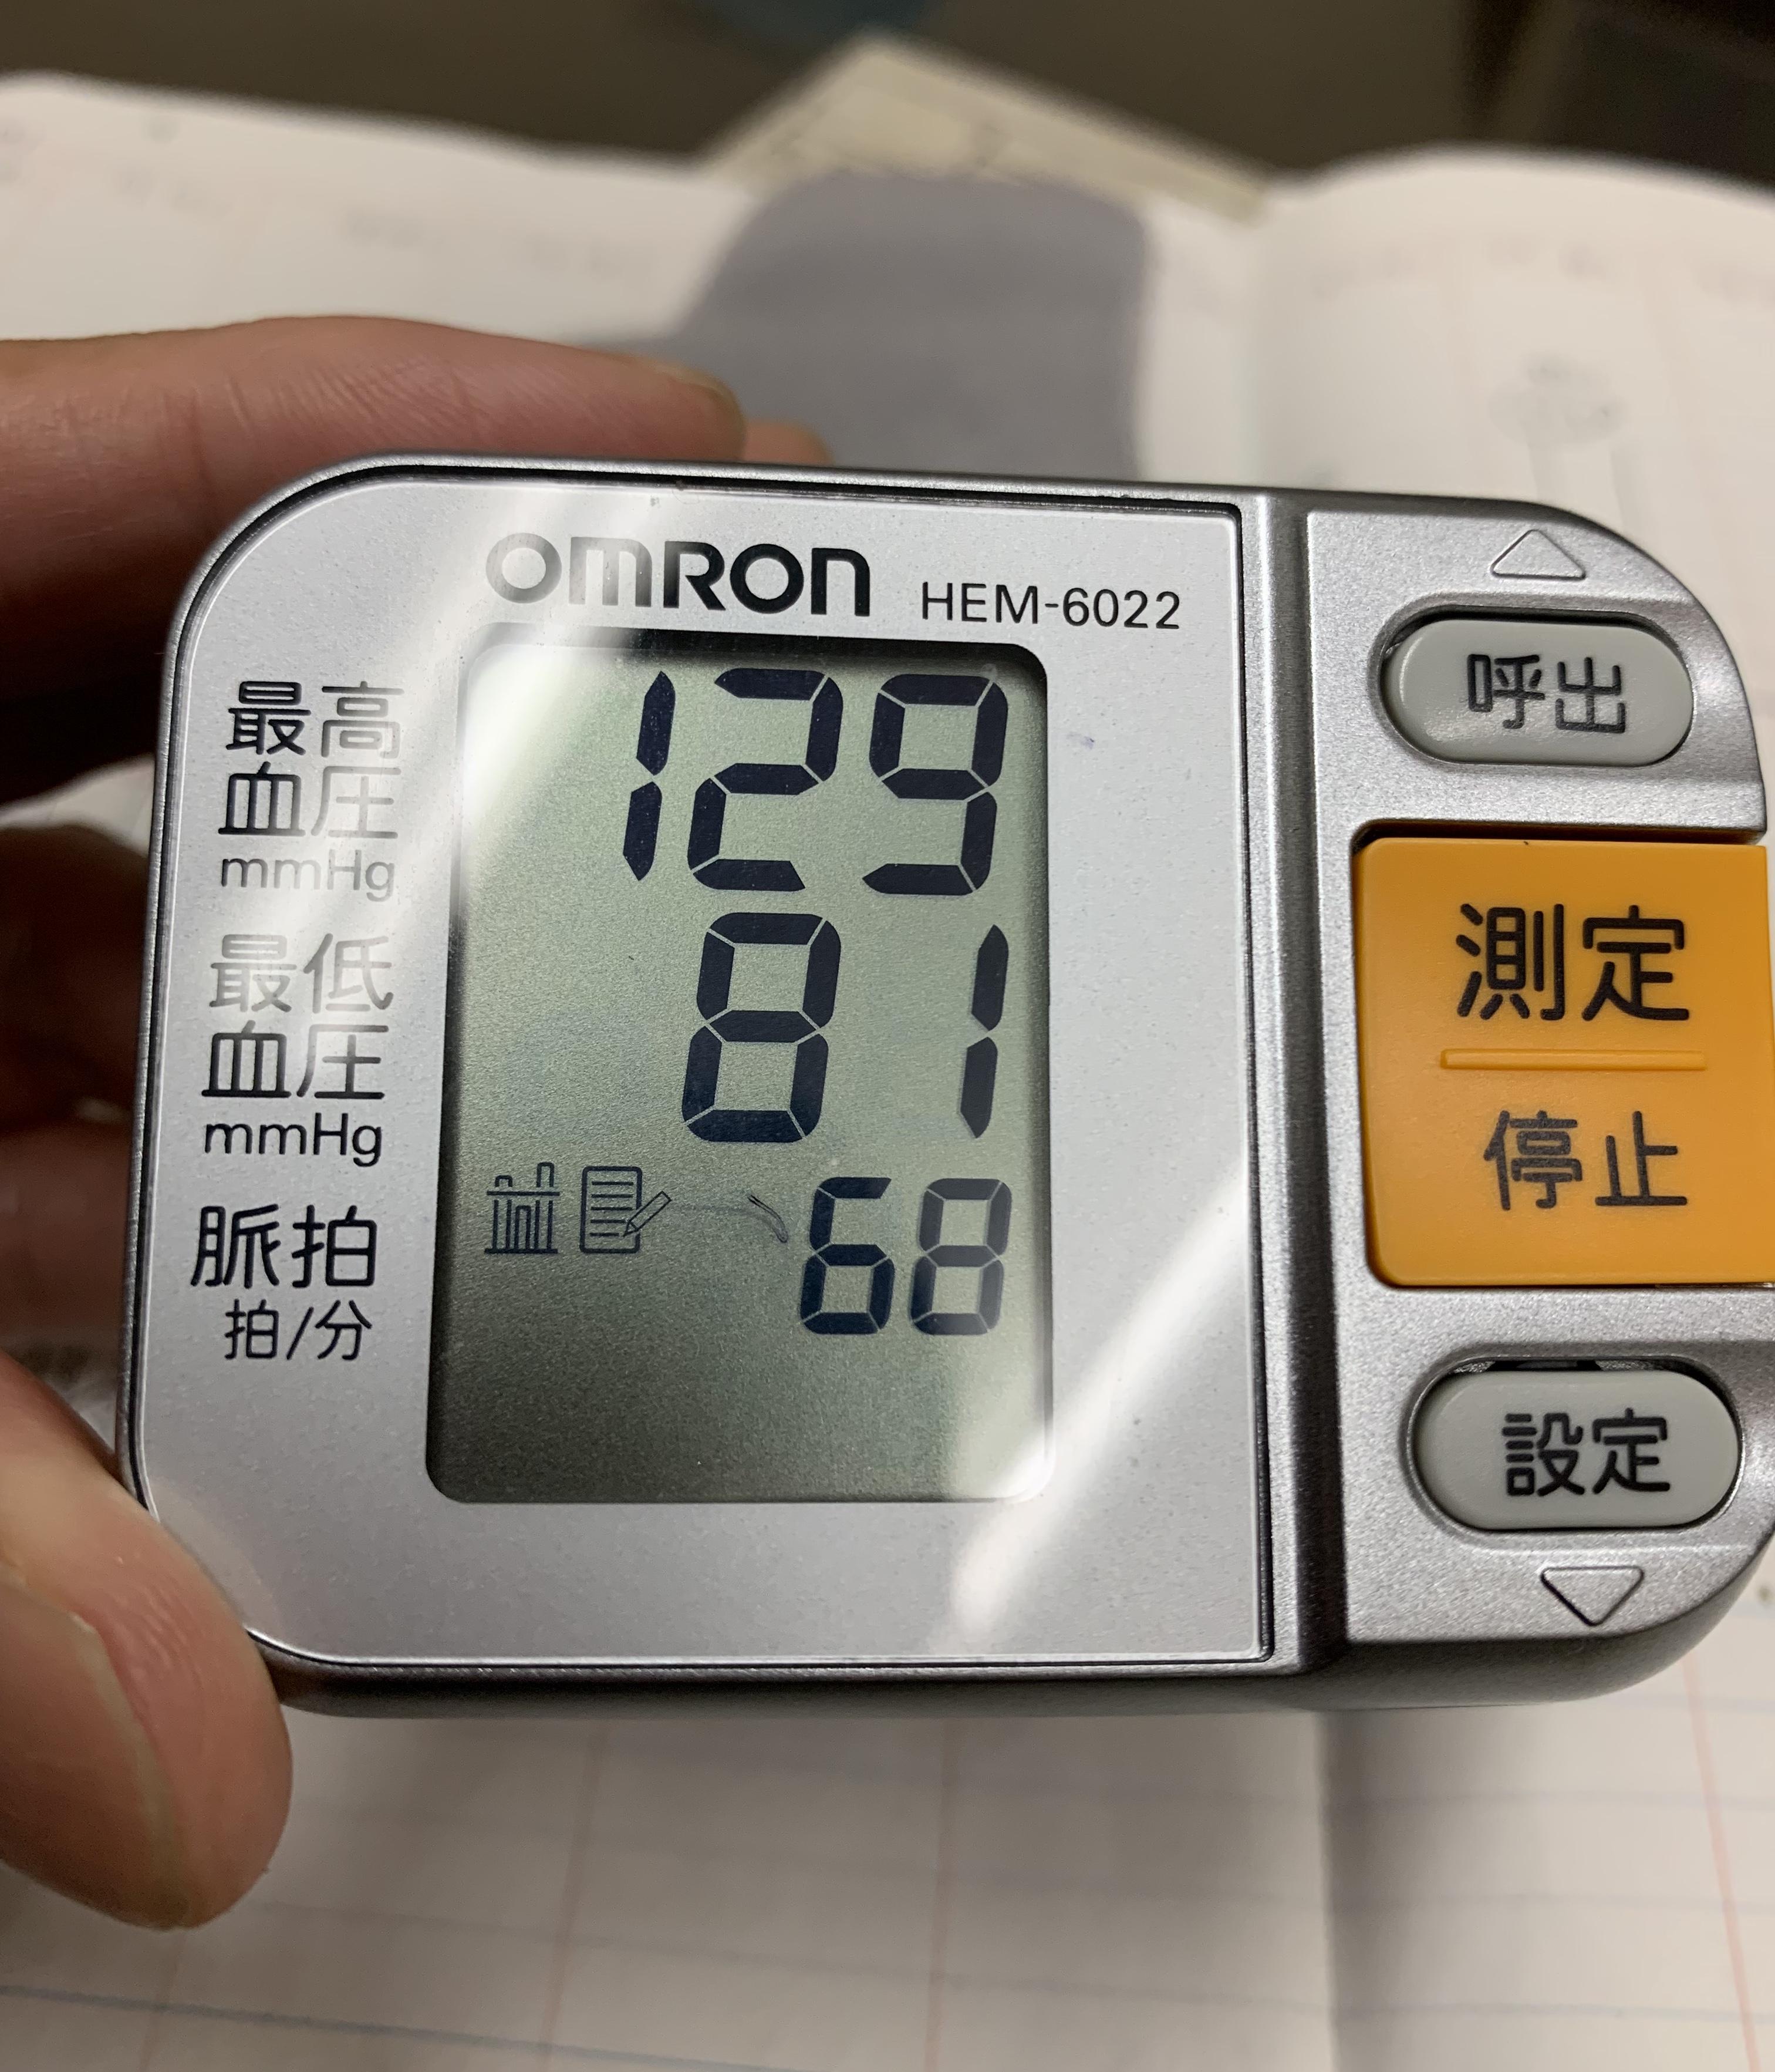 10kg痩せた時の血圧の変化。